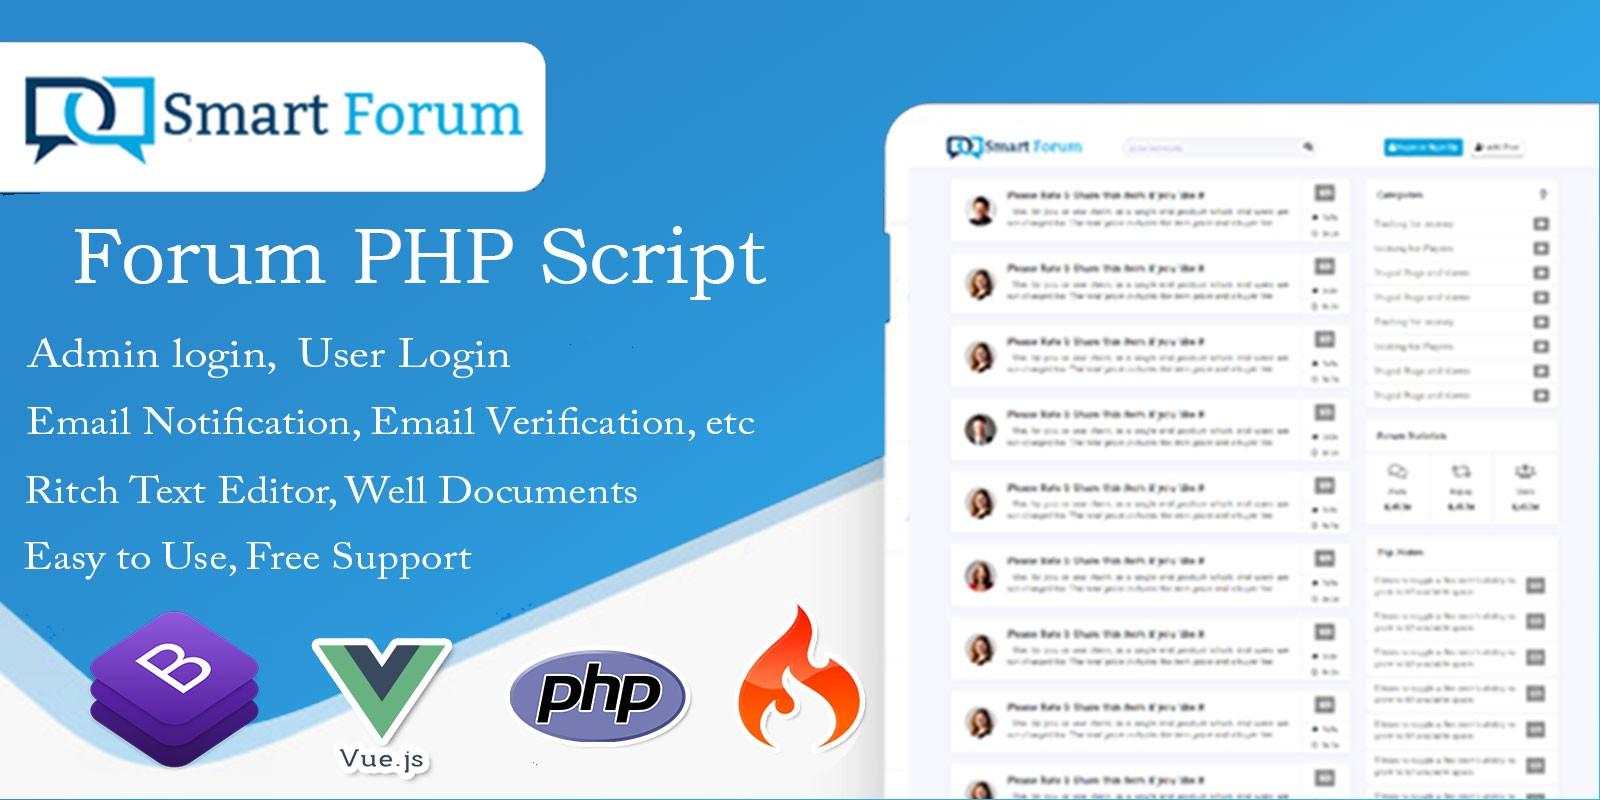 Smart Forum - Forum PHP Script